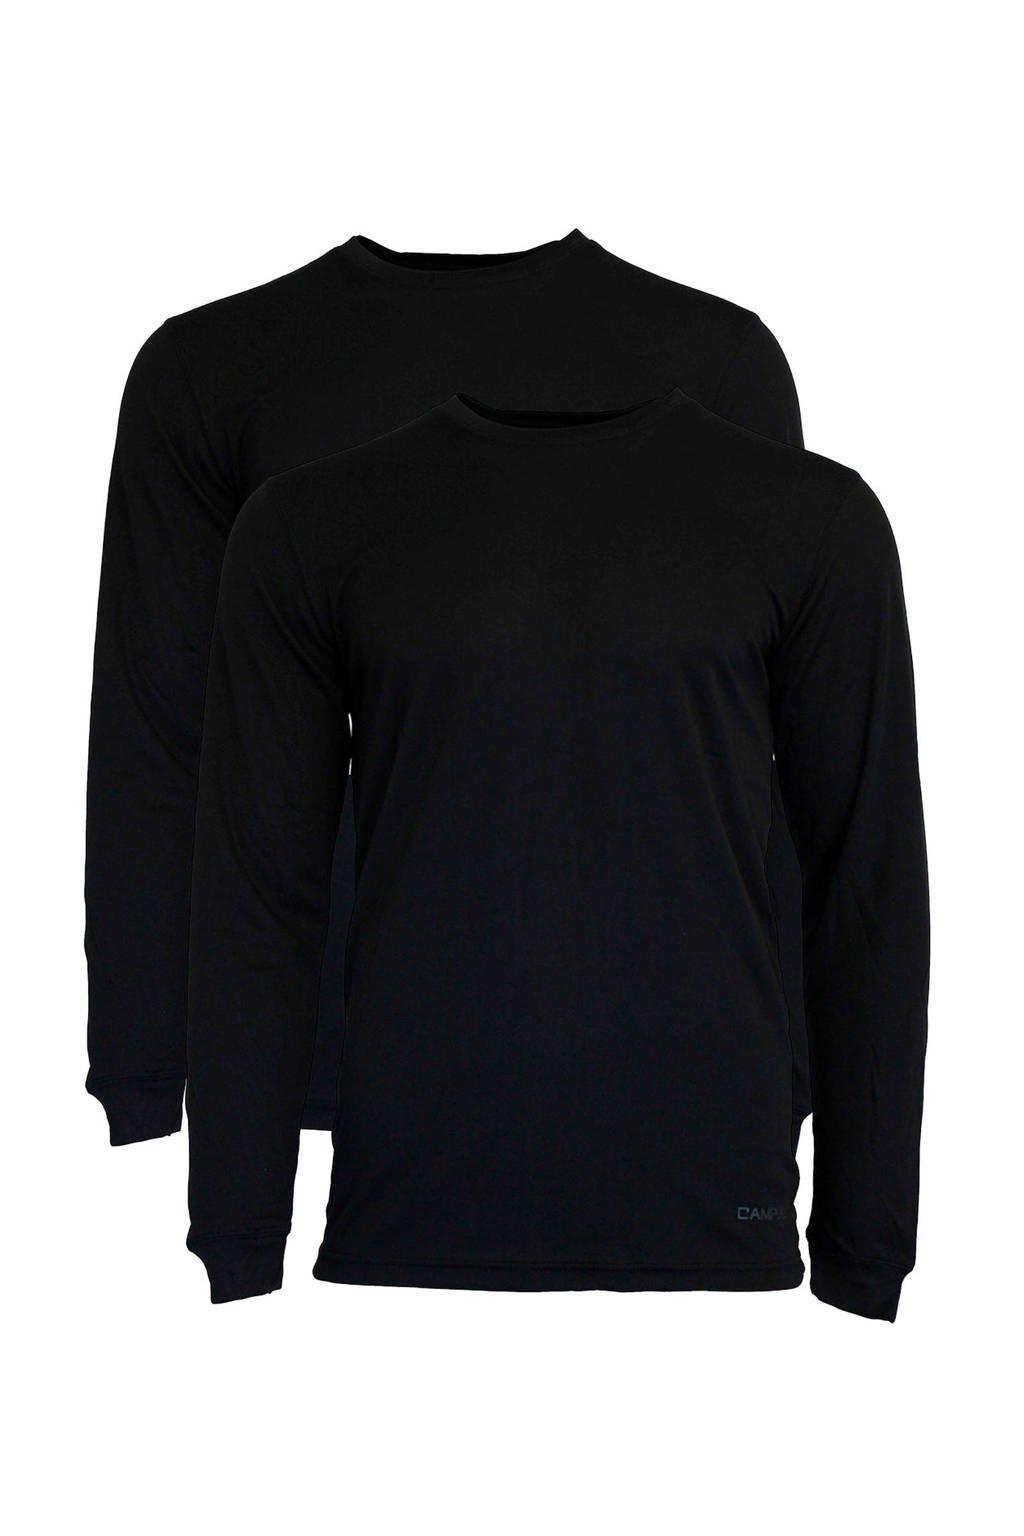 Campri thermo shirt (set van 2), Black